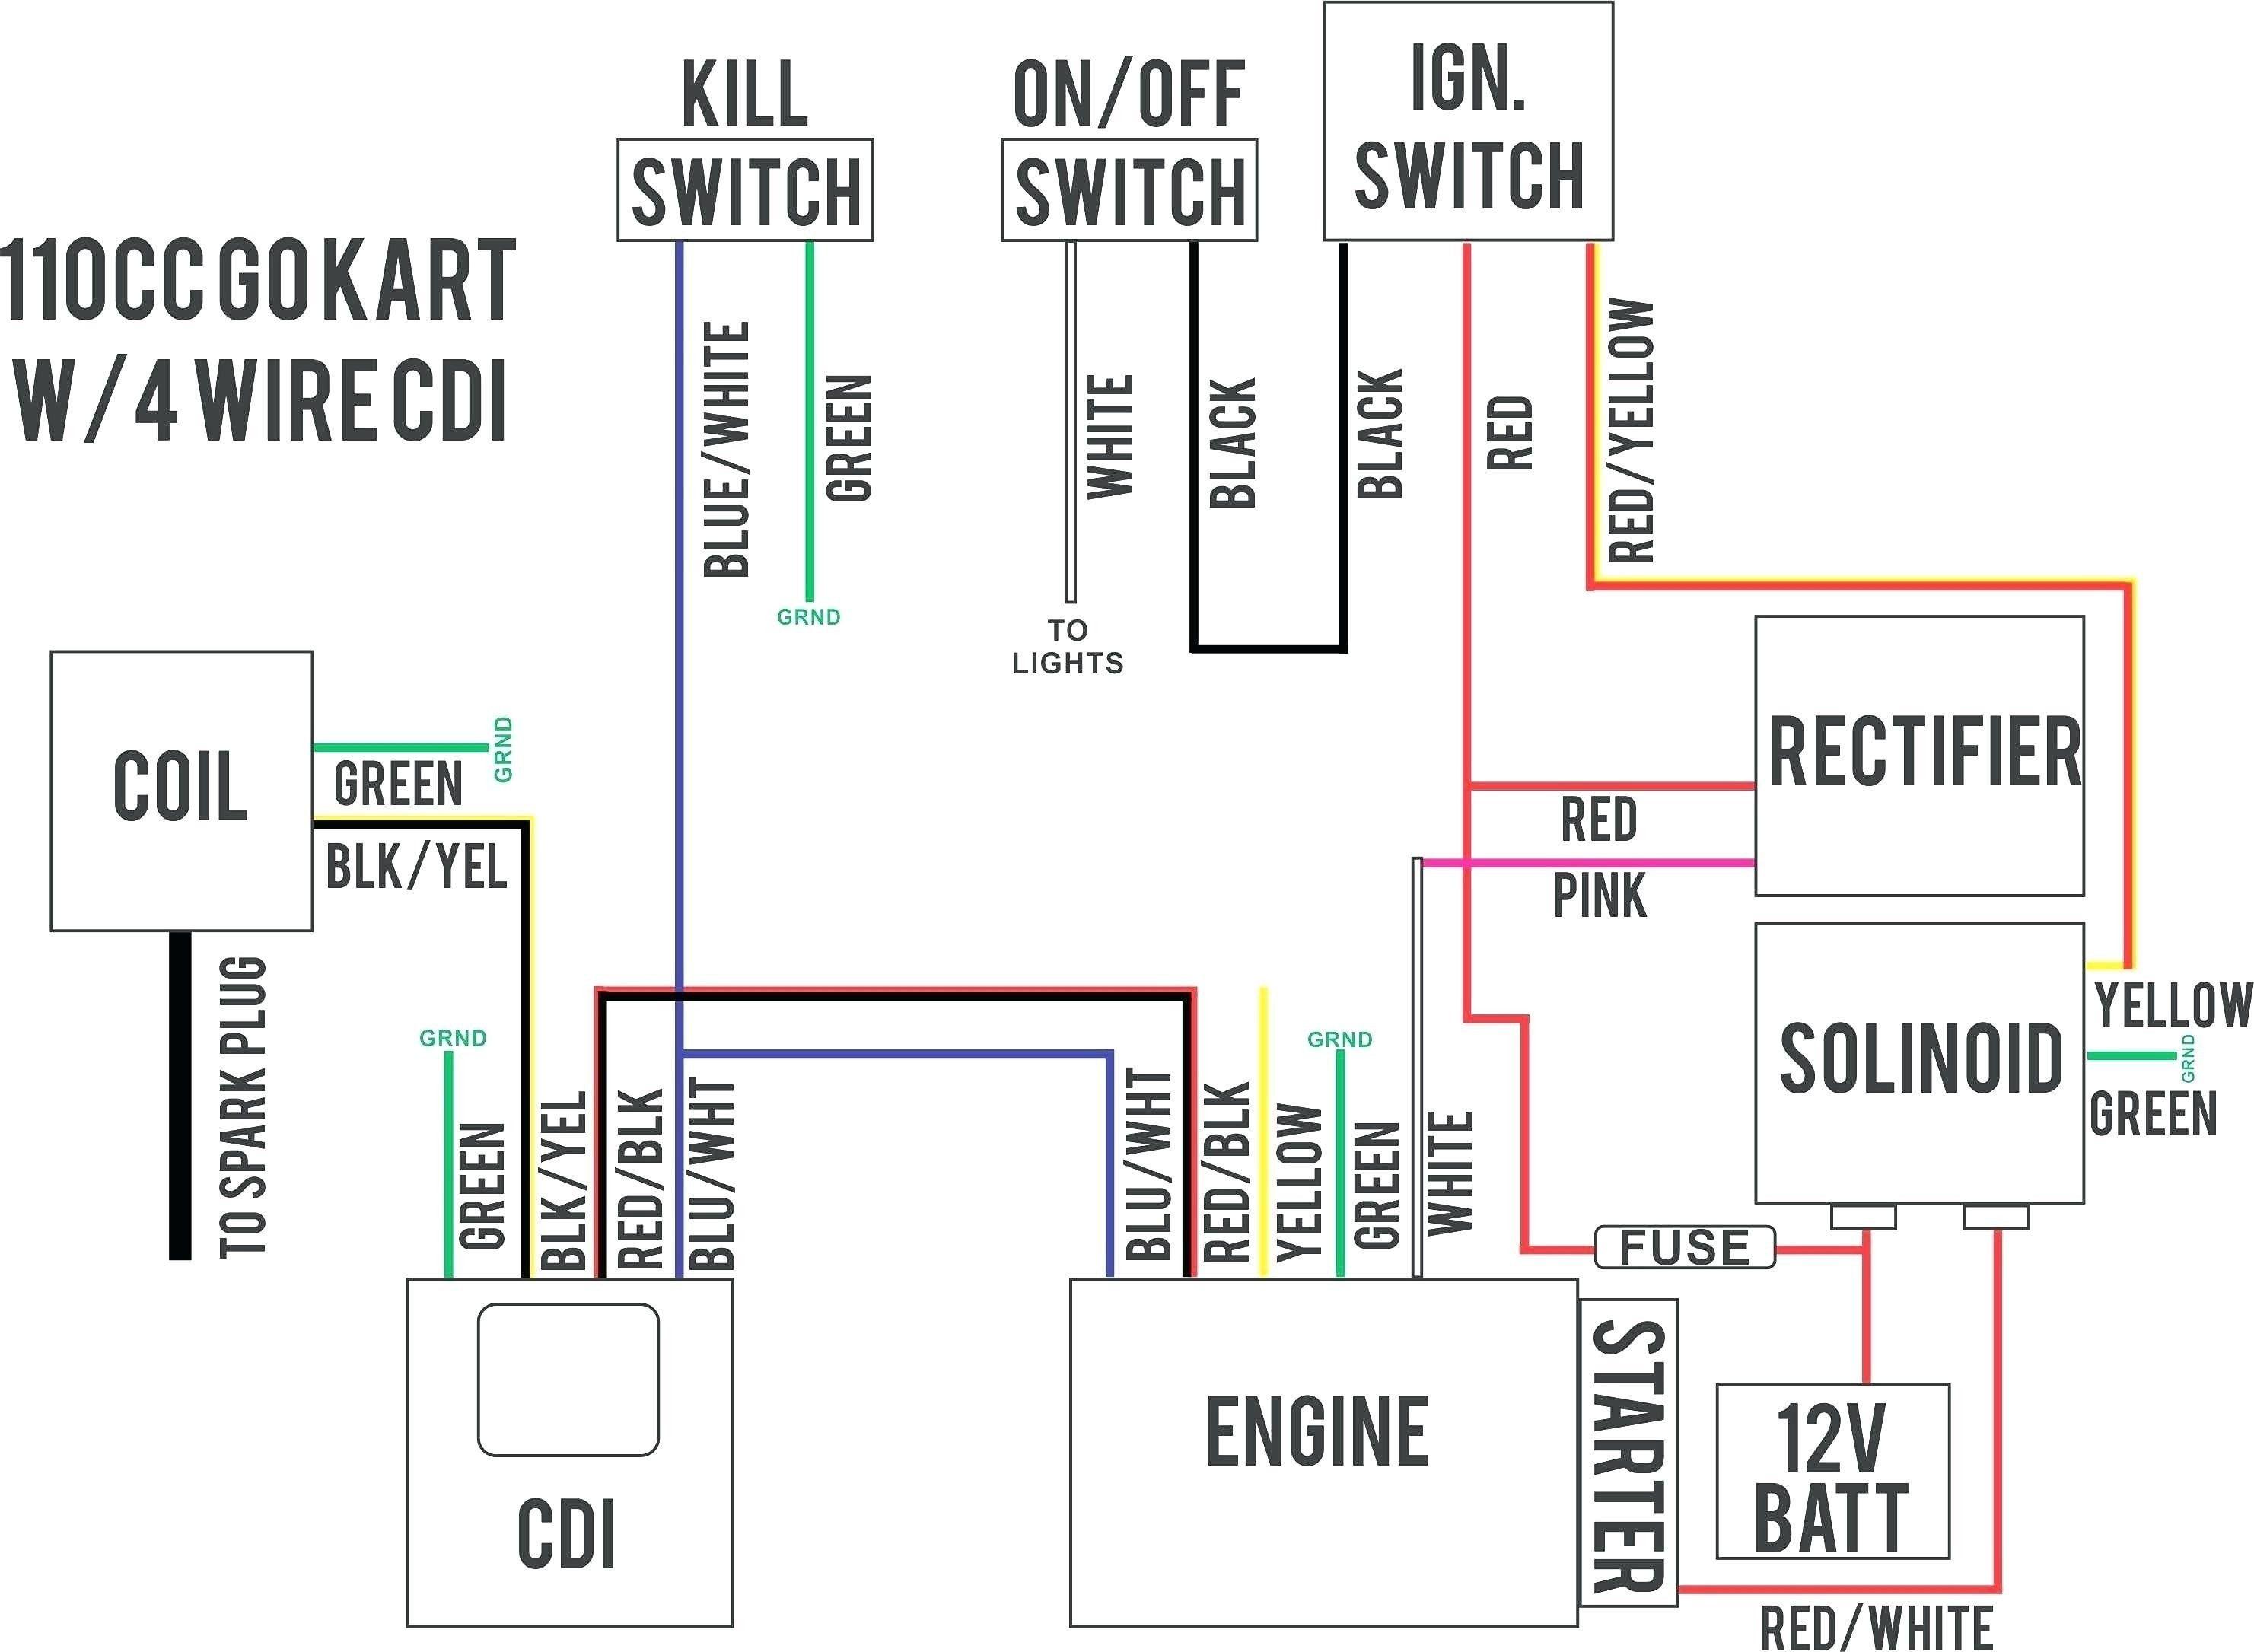 Remote Start Wiring Diagrams Electrical Wiring Diagram Motorcycle Wiring Electrical Diagram